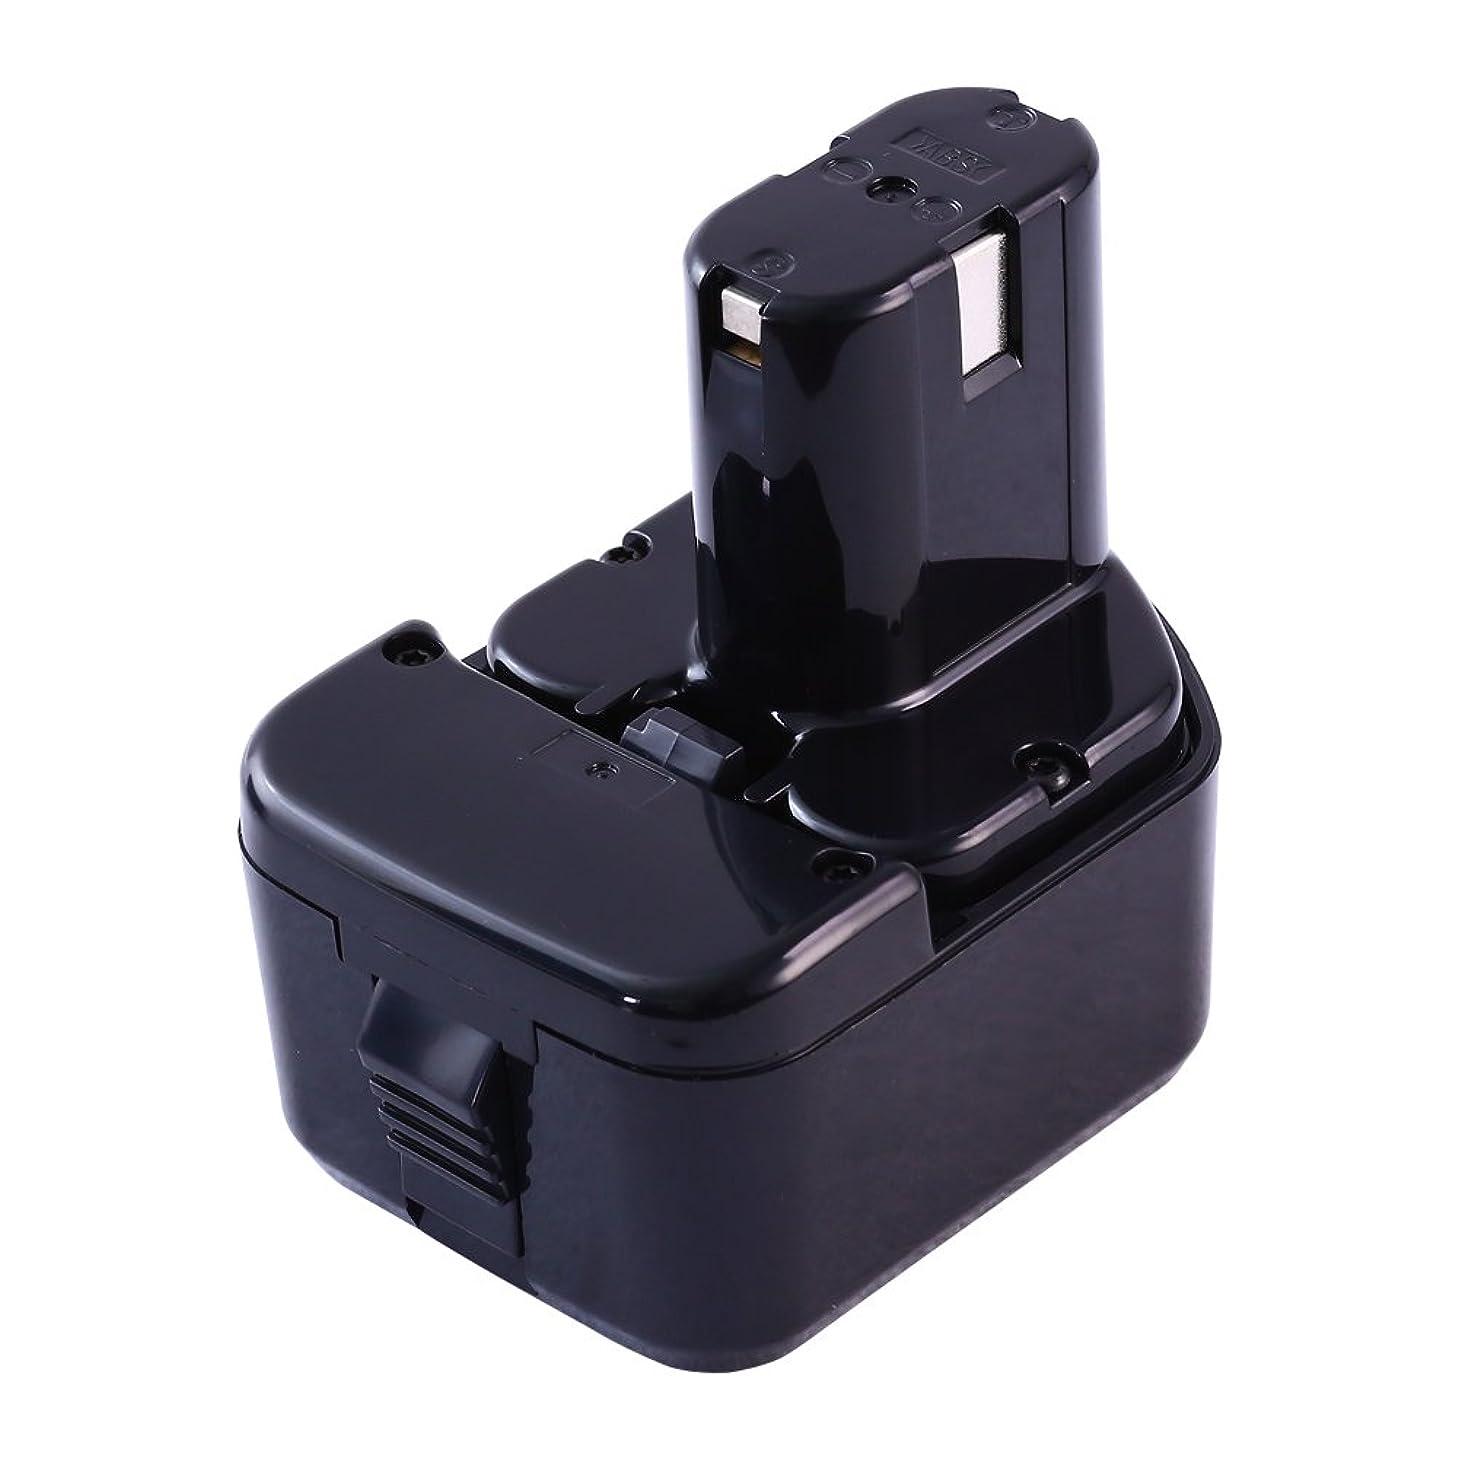 EB1214 EB1214S 日立12vバッテリー 日立バッテリー12v 3000mAh HITACHI EB1214S EB1212S EB1214l EB1220bl EB1212S 対応 電動工具バッテリー 日立 互換バッテリー12v ニッケル水素 PSE認証取得済み 安心の1年保証 無料交換可能